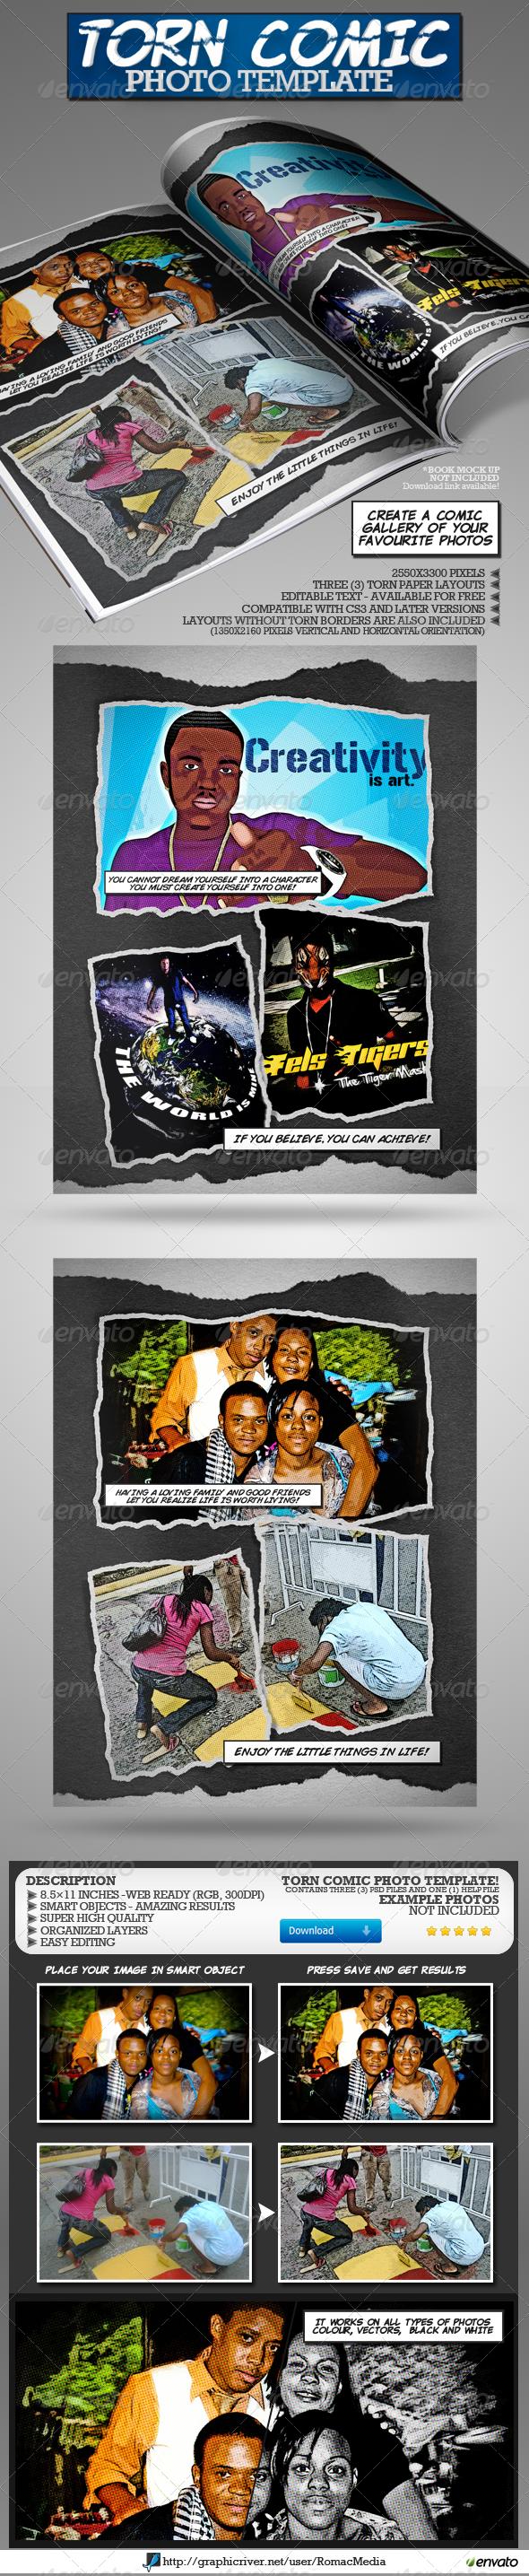 Torn Comic Photo Template - Artistic Photo Templates